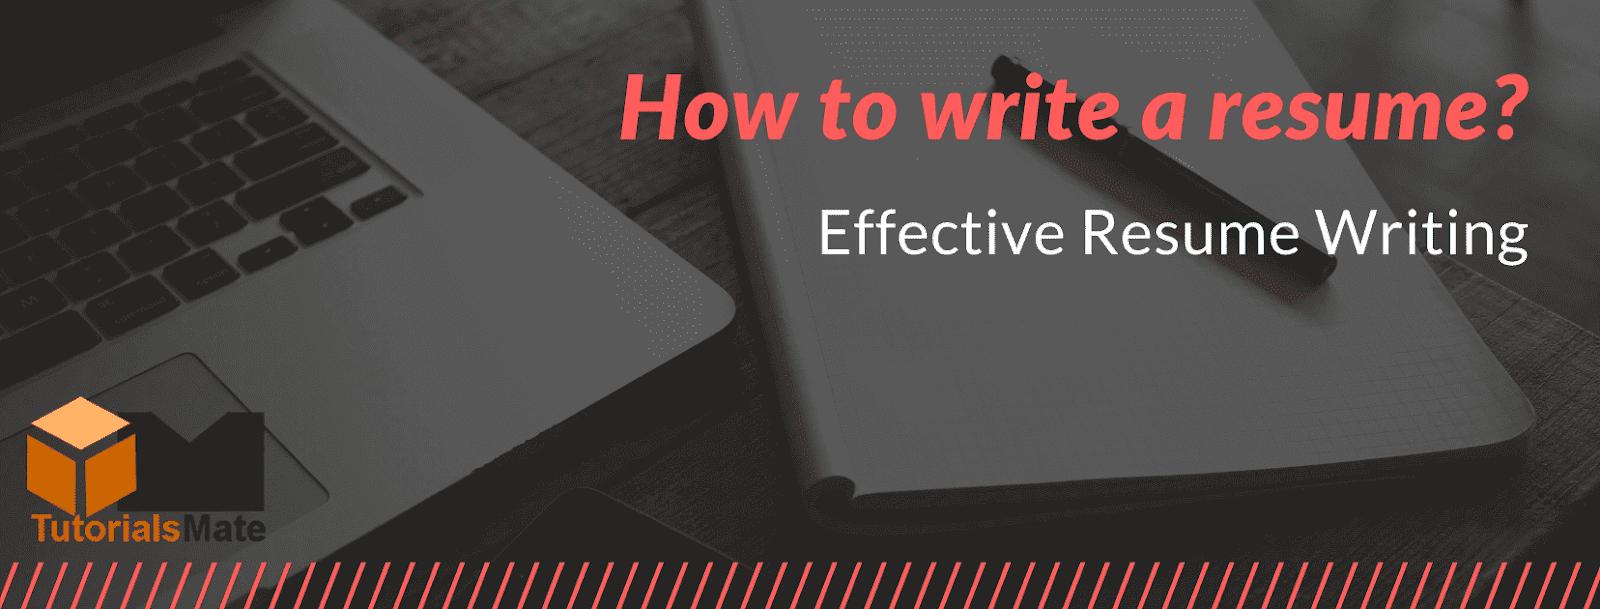 How to Write a Resume - TutorialsMate